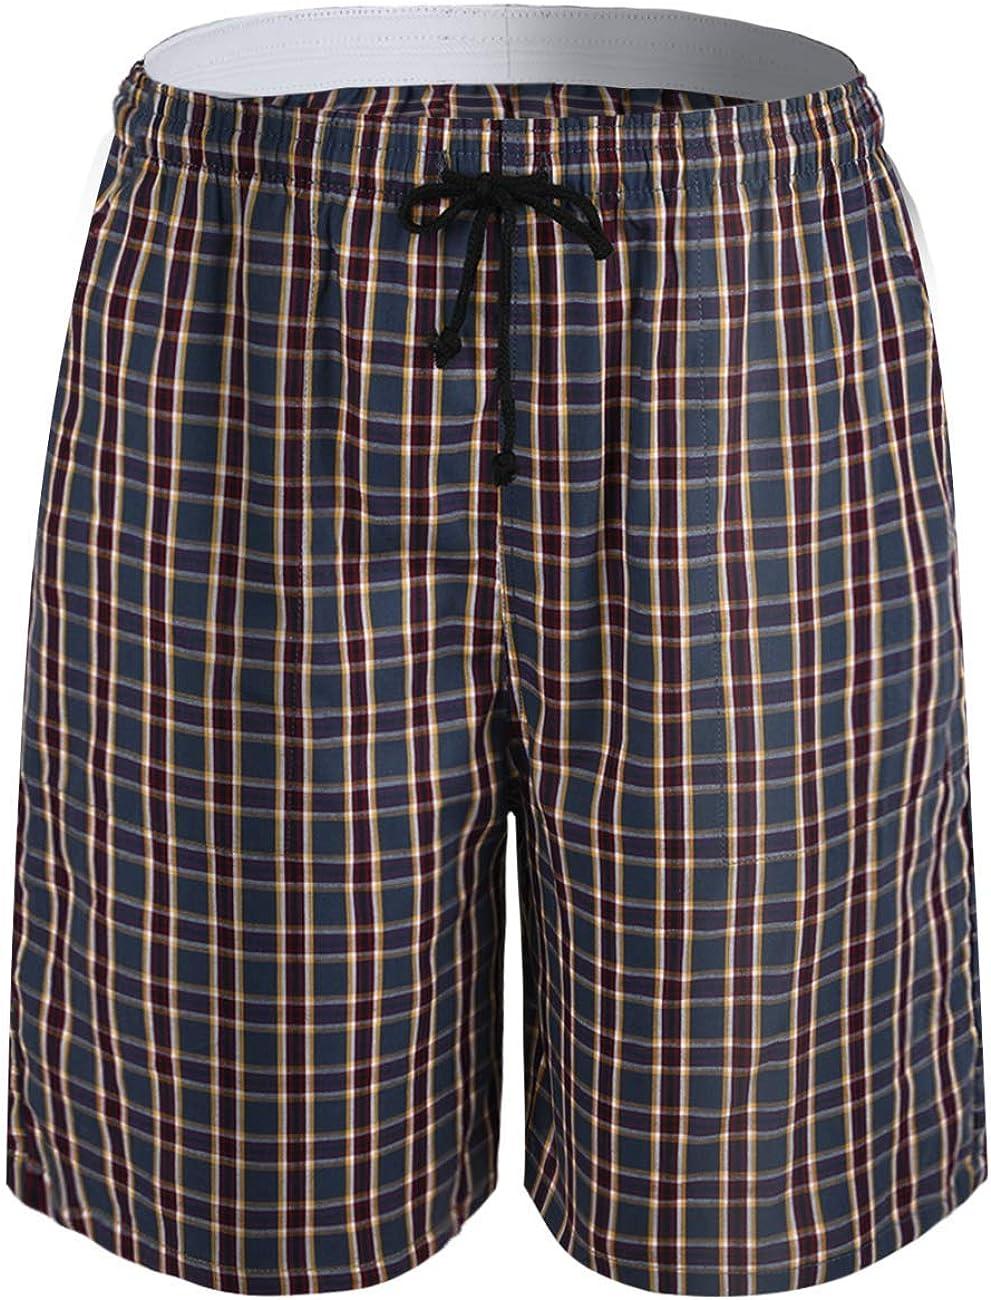 ninovino Men's Soft Woven Pajama Short 100% Cotton Plaid with Elastic Waistband Sleep Shorts